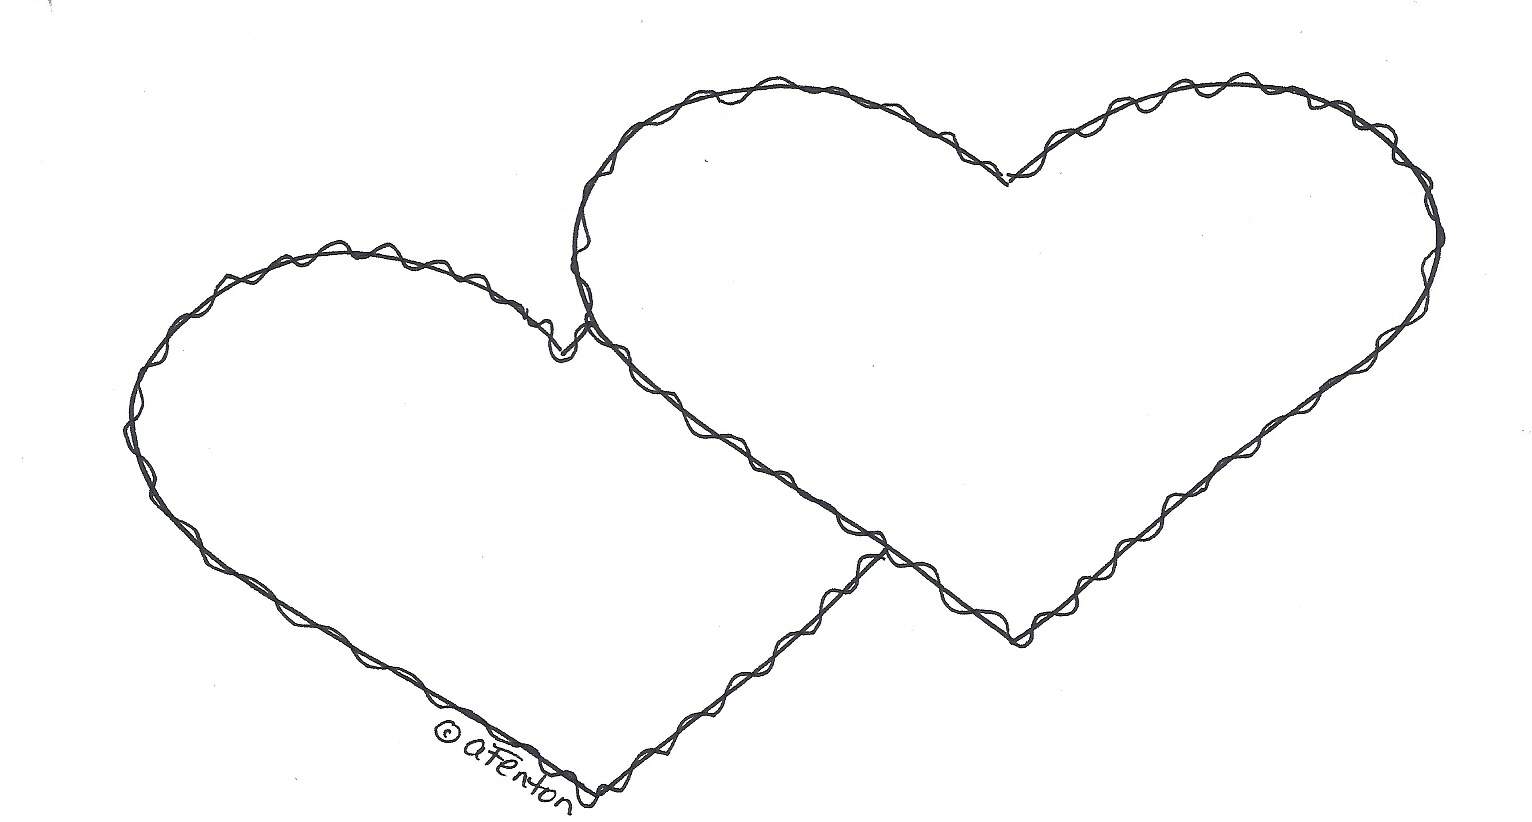 http://1.bp.blogspot.com/-kUlQNMNP8c8/Uvk0Zn6cKzI/AAAAAAAACqw/-yYE51-x8cc/s1600/2Valentine+Hearts+.png